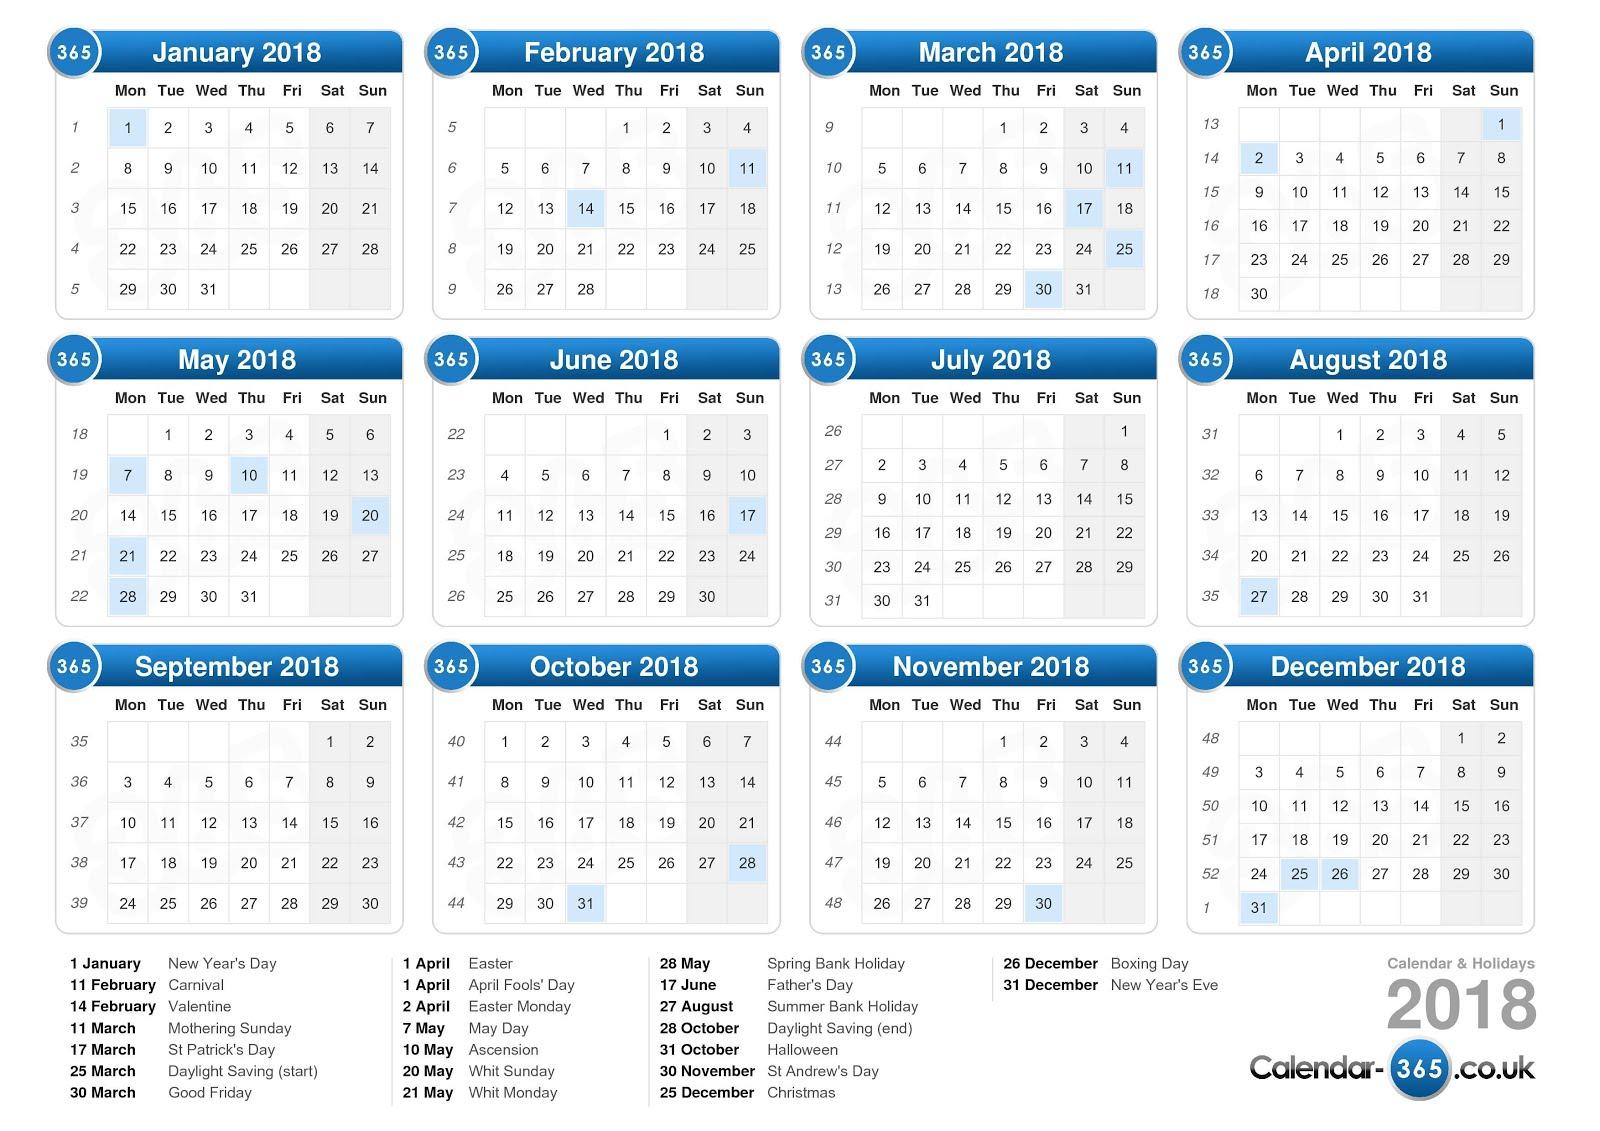 Calendar 2018 Nz With Public Holidays